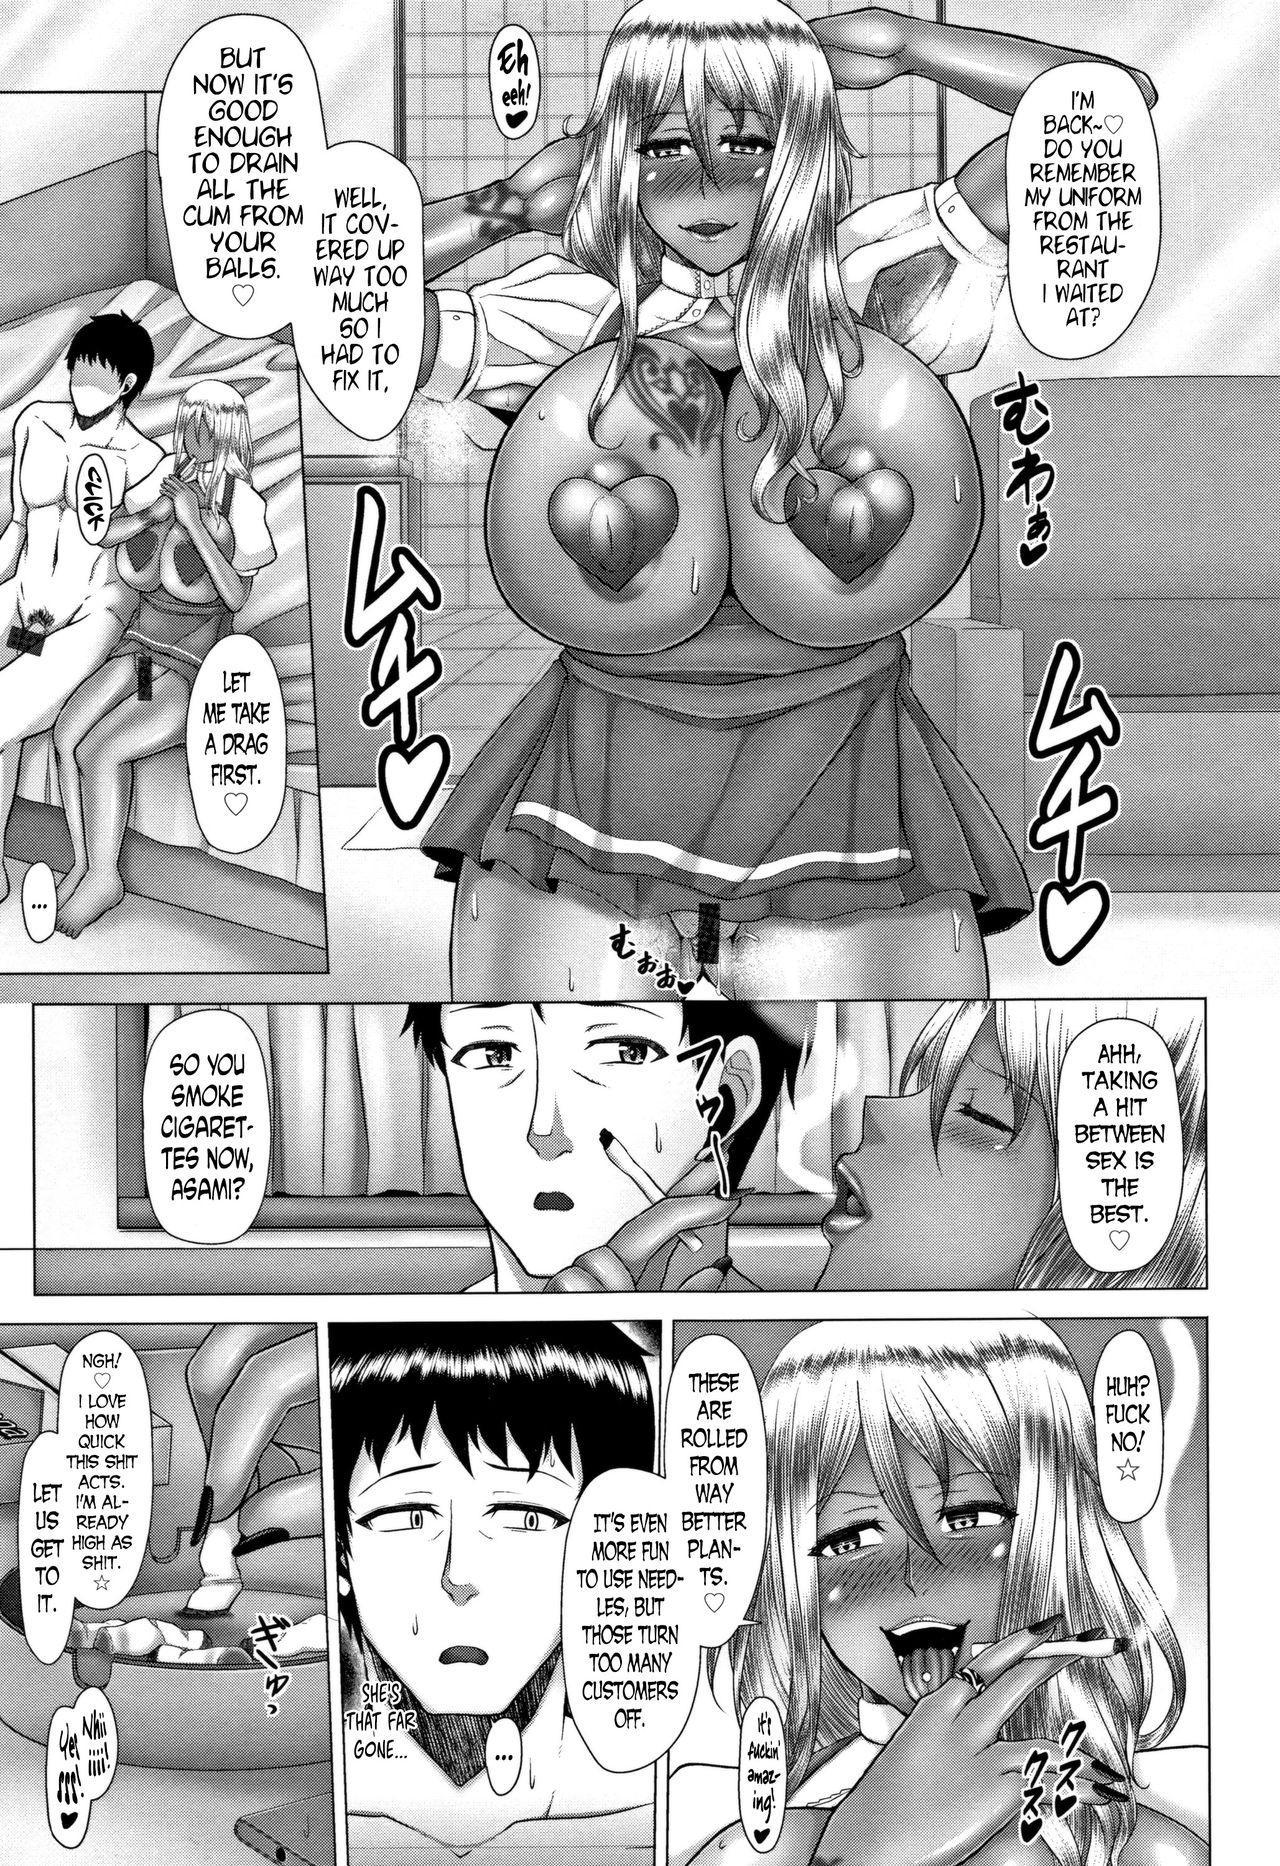 [Inoue Nanaki] Joushiki Daha! Kuro Gal Bitch-ka Seikatsu Ch. 1-3, 5-8 [English] [Dark Mac + N04h] 112